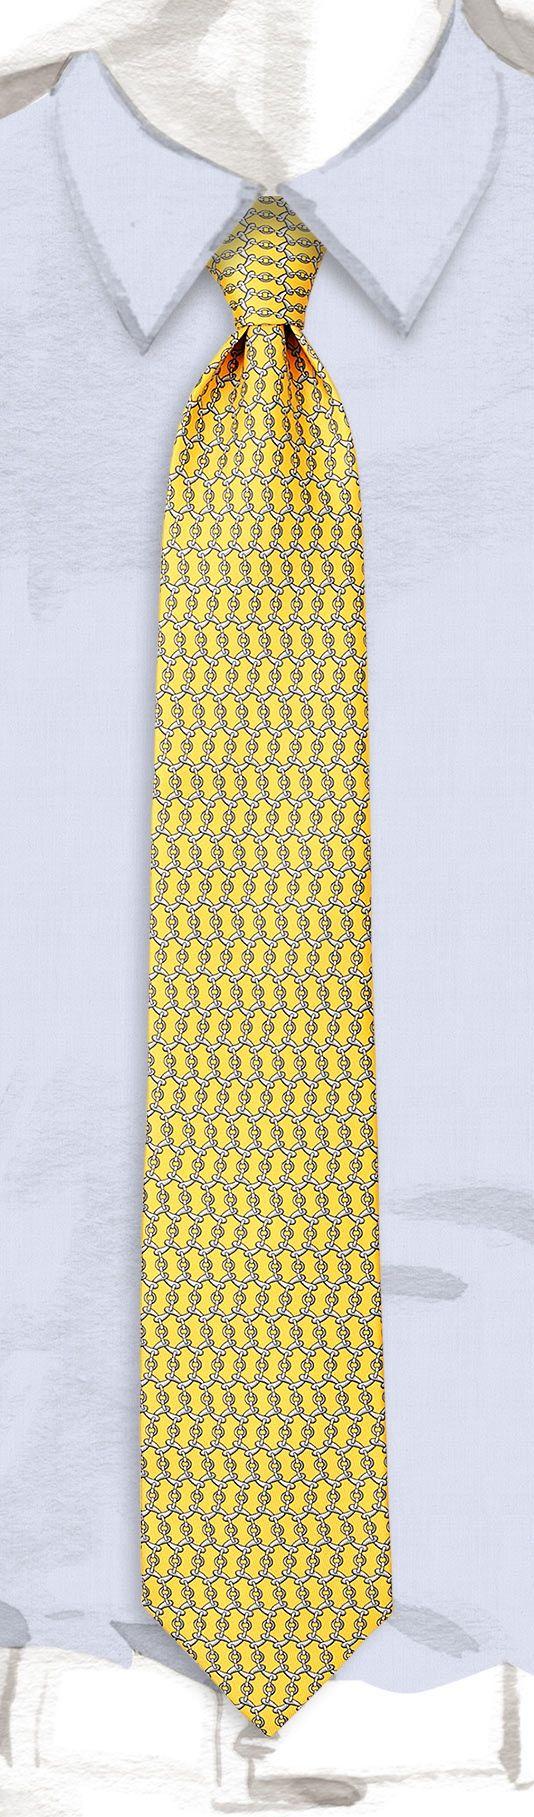 e4ab58c02af4 Ties Hermès Yellow - Printed - Men | Hermès, Official Website ...